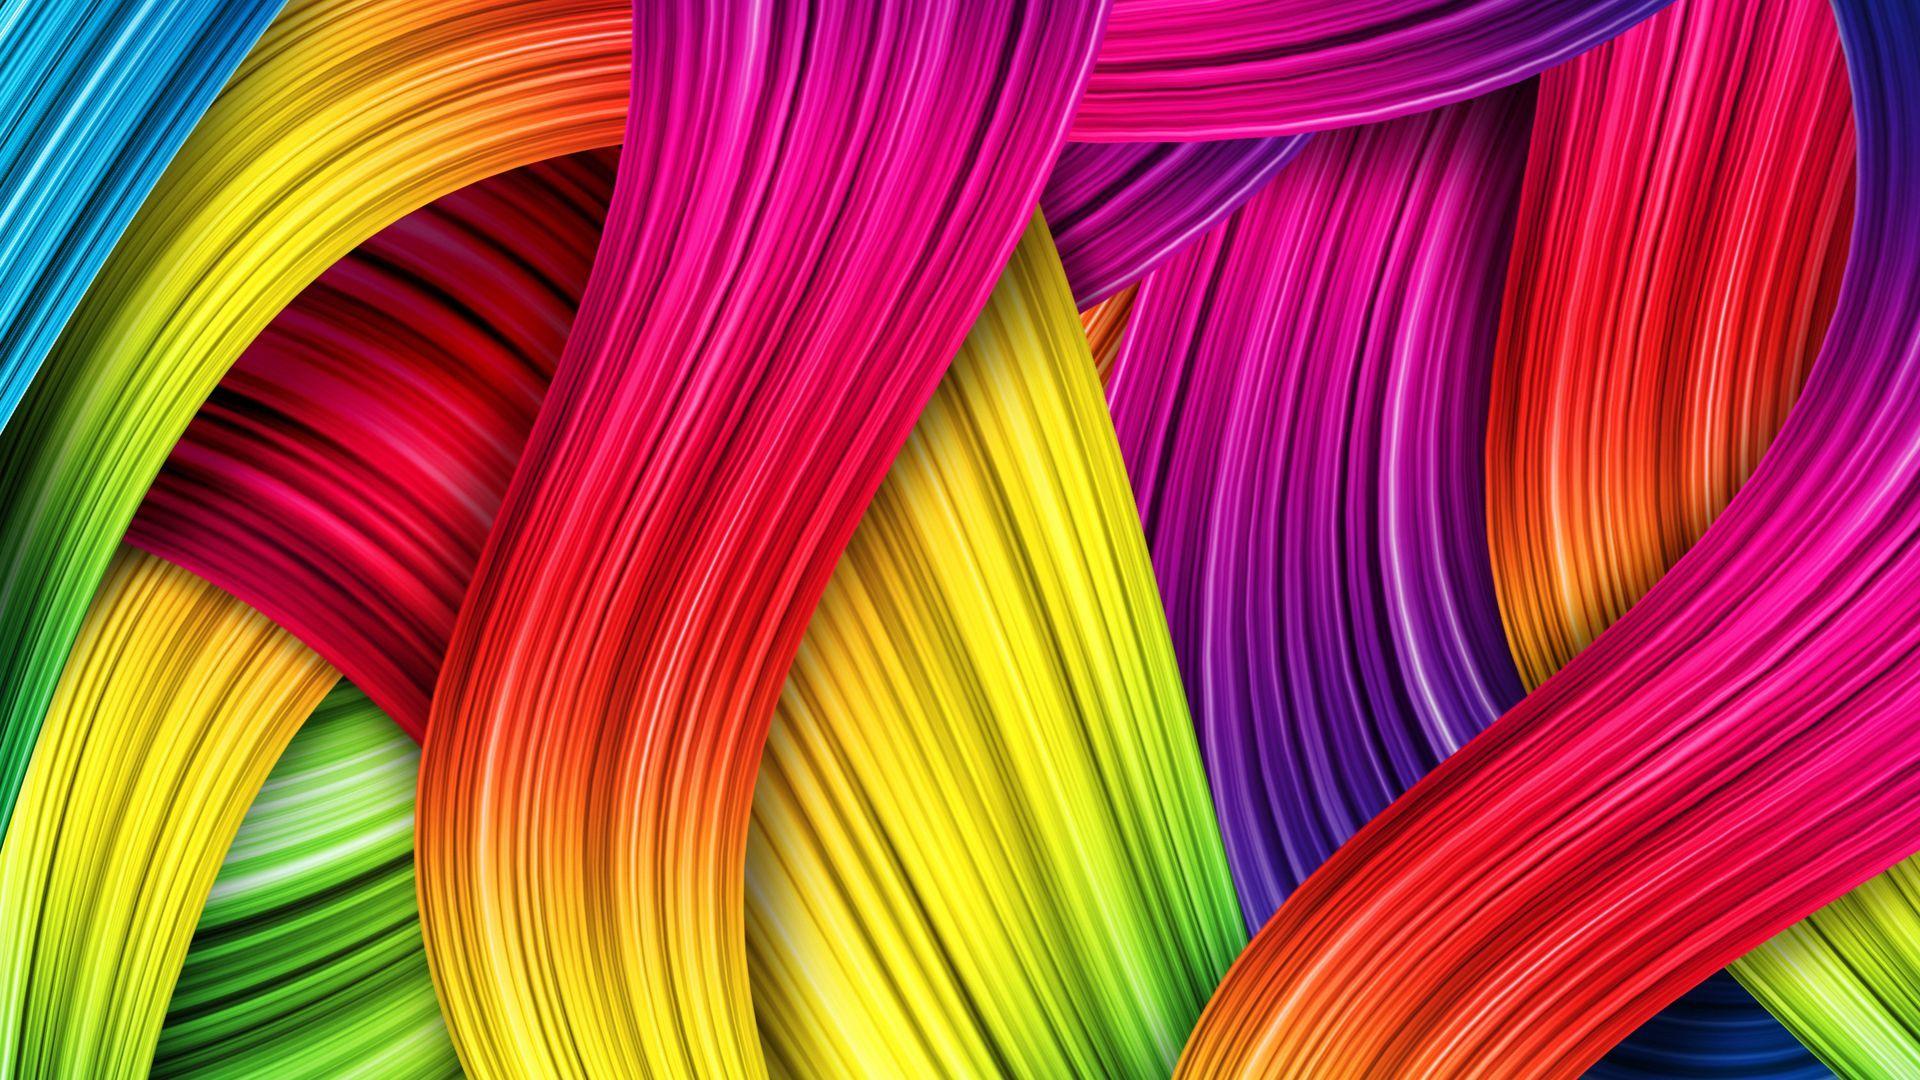 Colorful Desktop Background , HD Wallpaper & Backgrounds